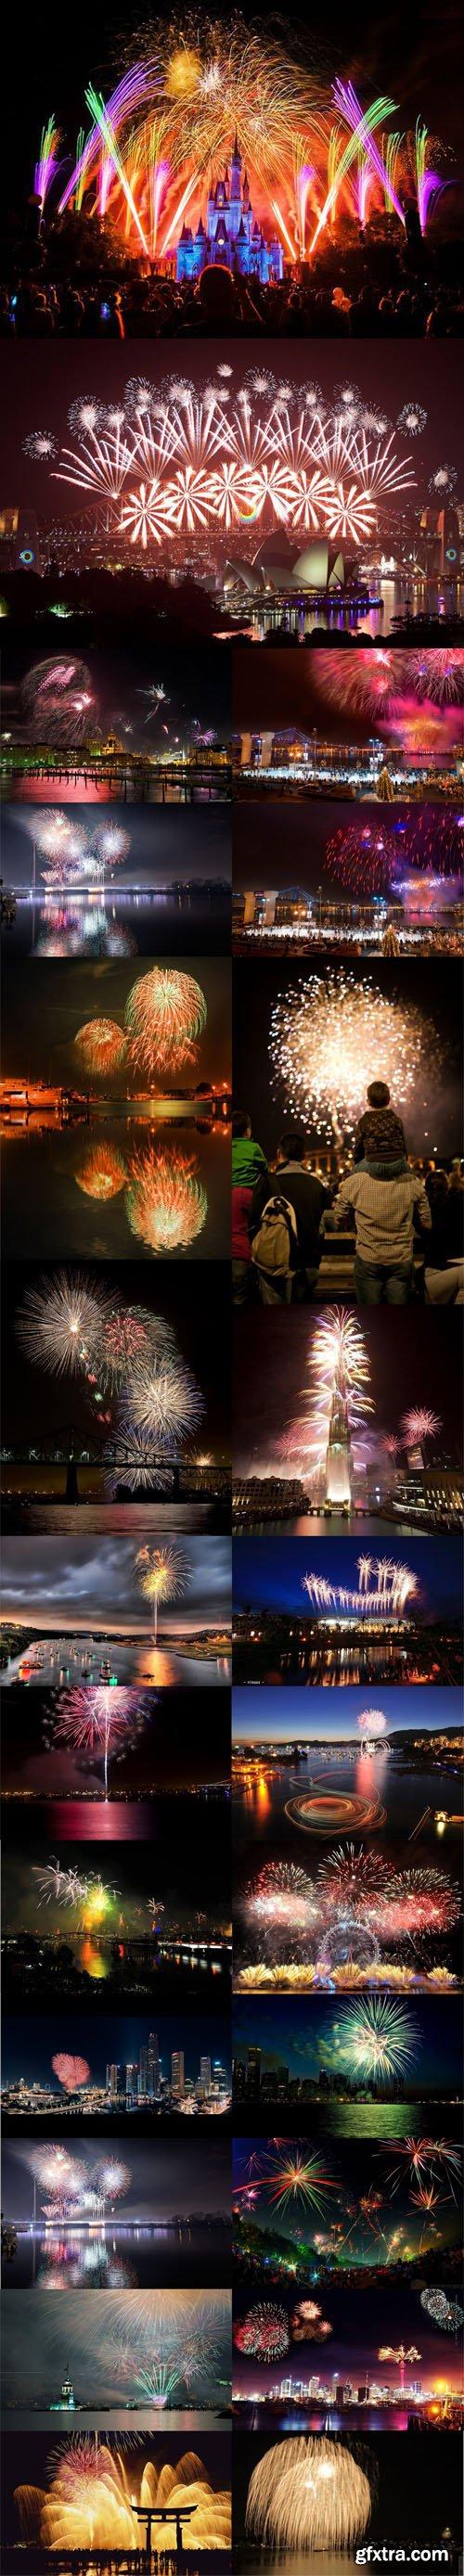 Around the World - New Year Fireworks Photos